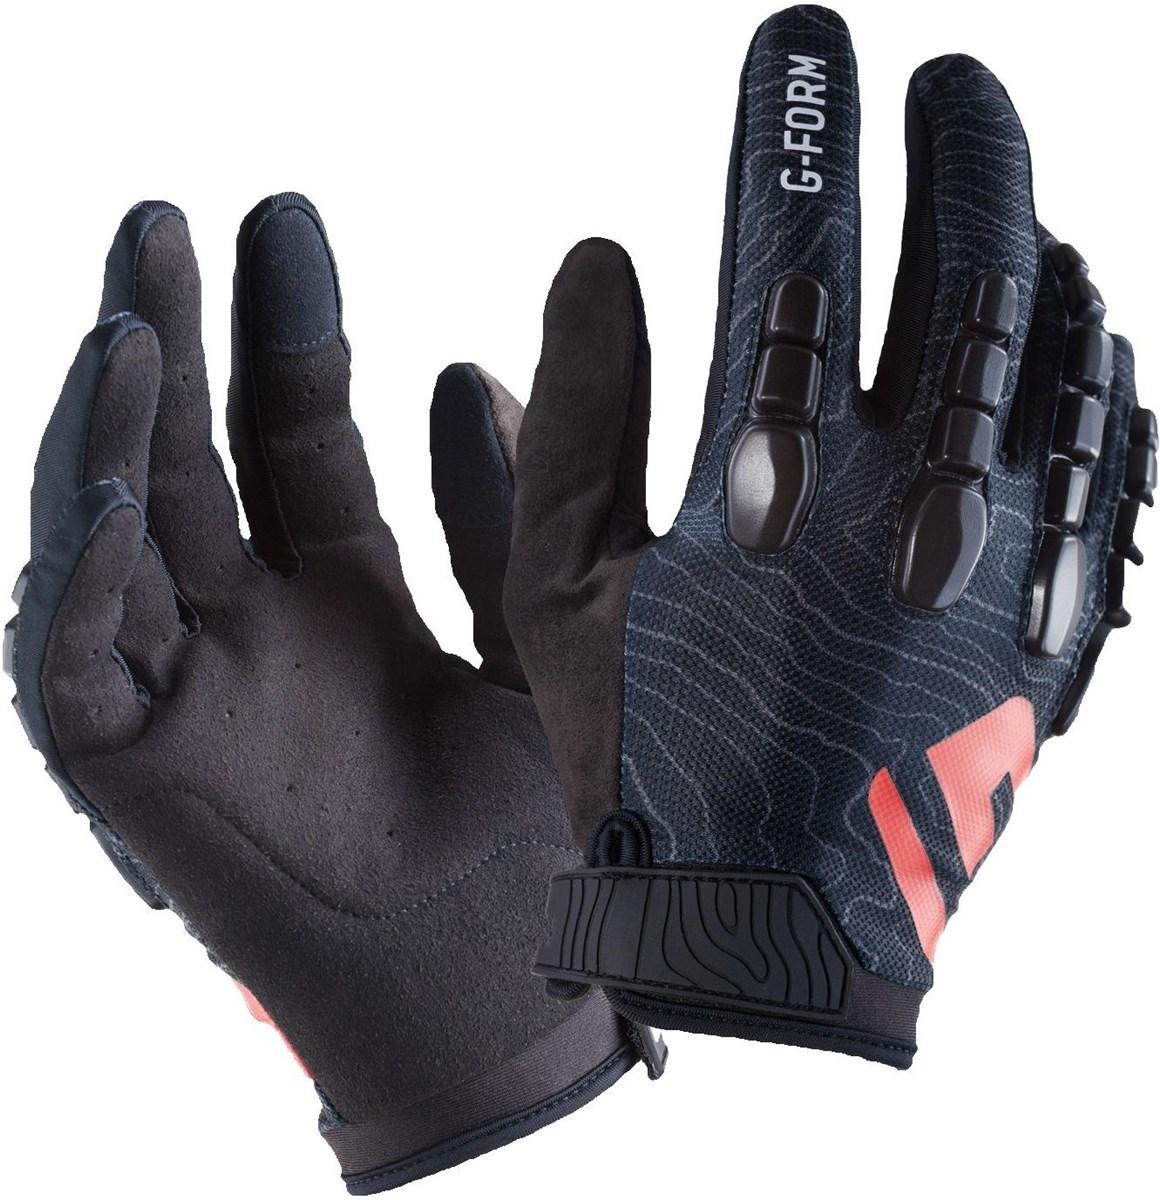 G-Form Pro Trail Long Finger Gloves | Gloves